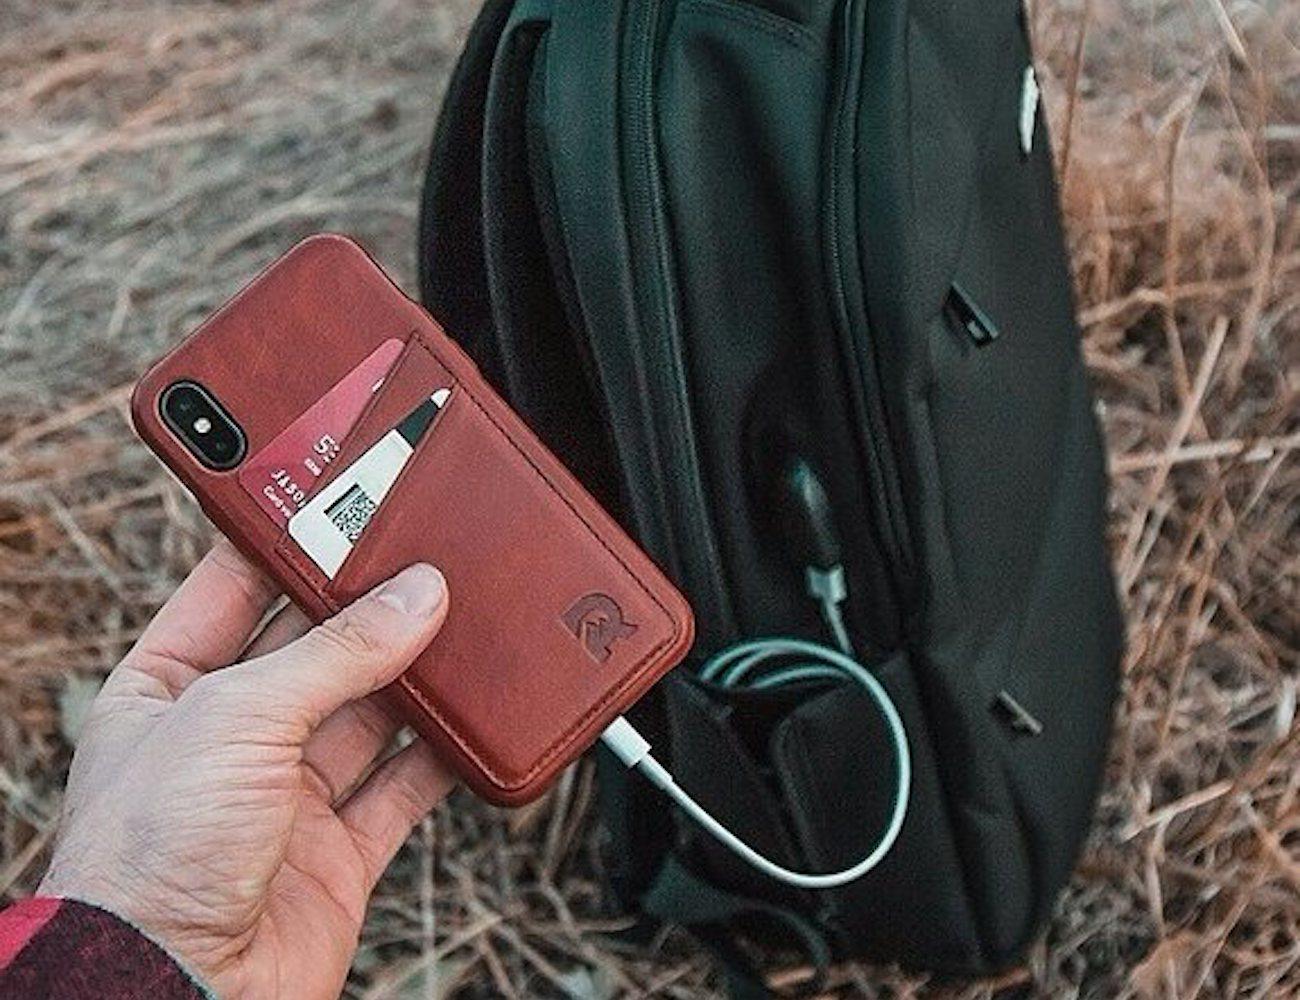 Ridge Wallet iPhone X Card Case